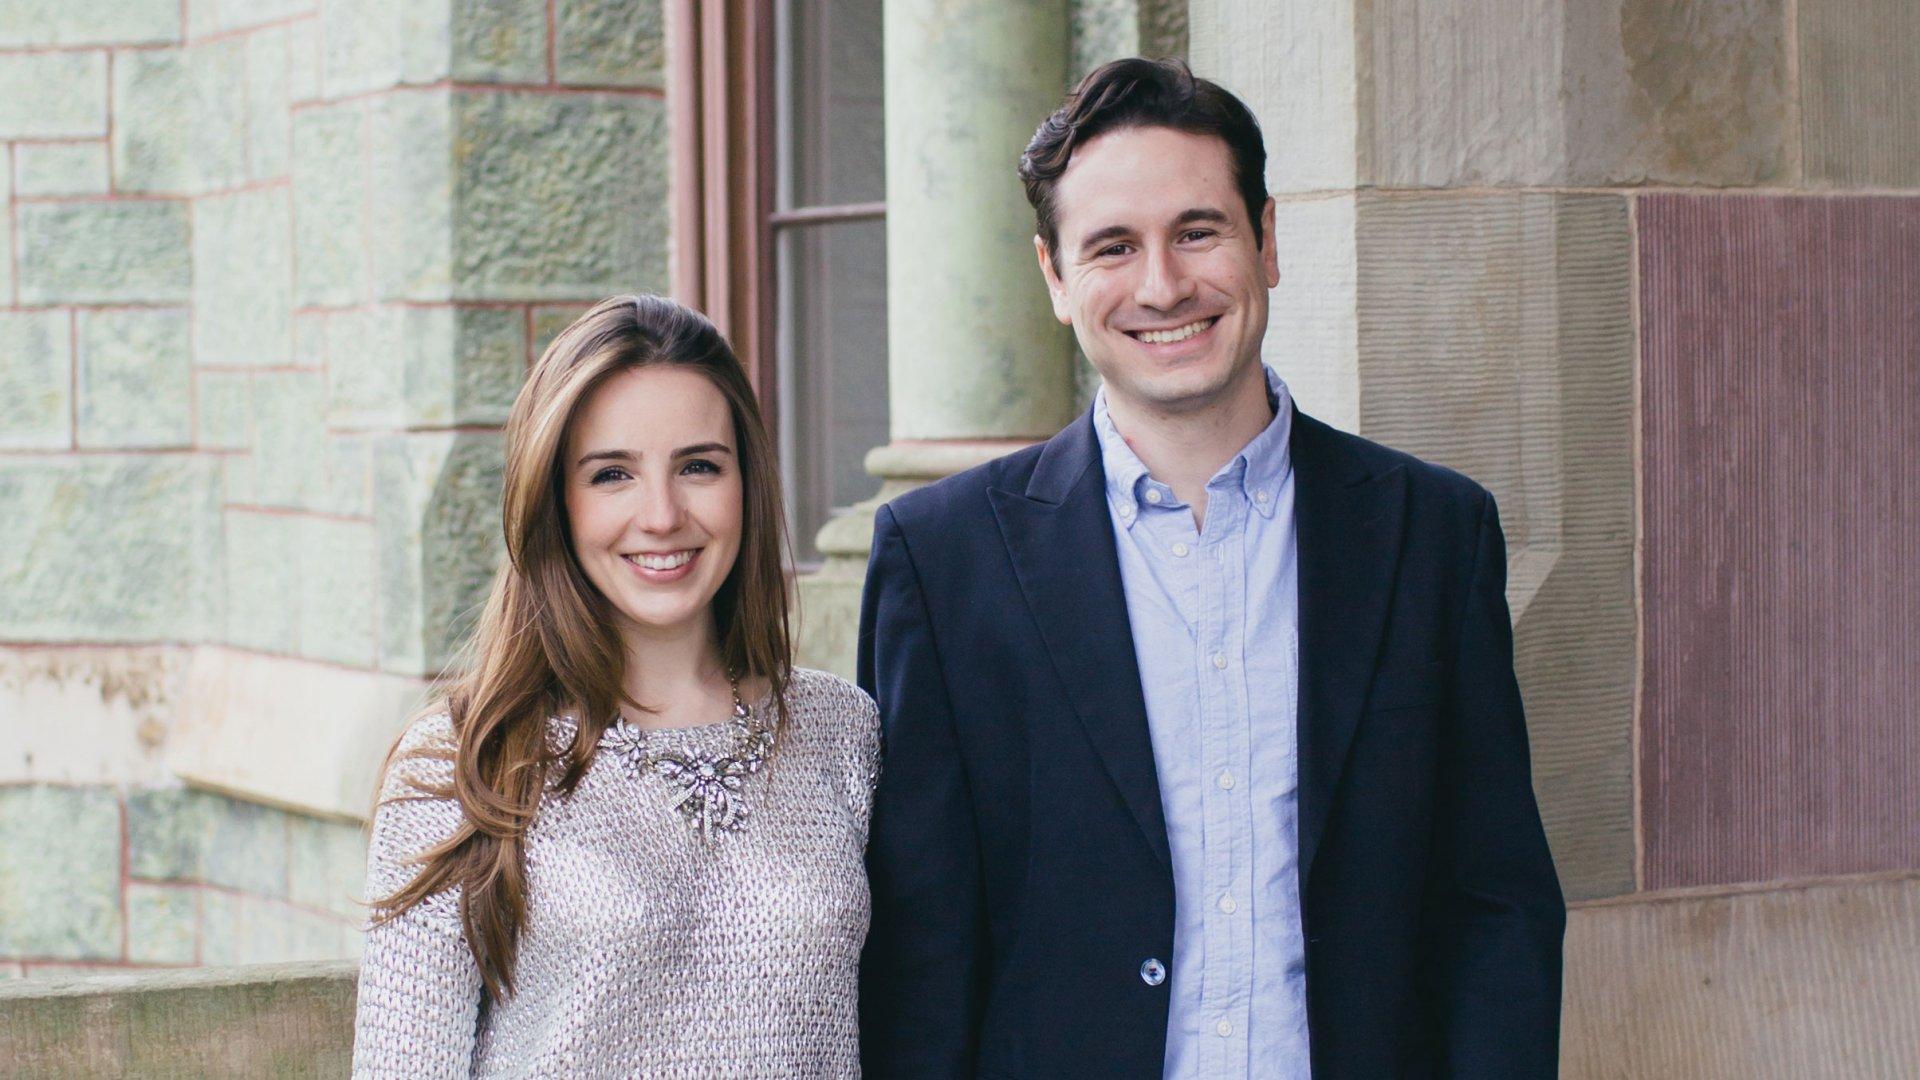 Mariana Hernandez and Cristian Rios, Founders of White Rabbit.